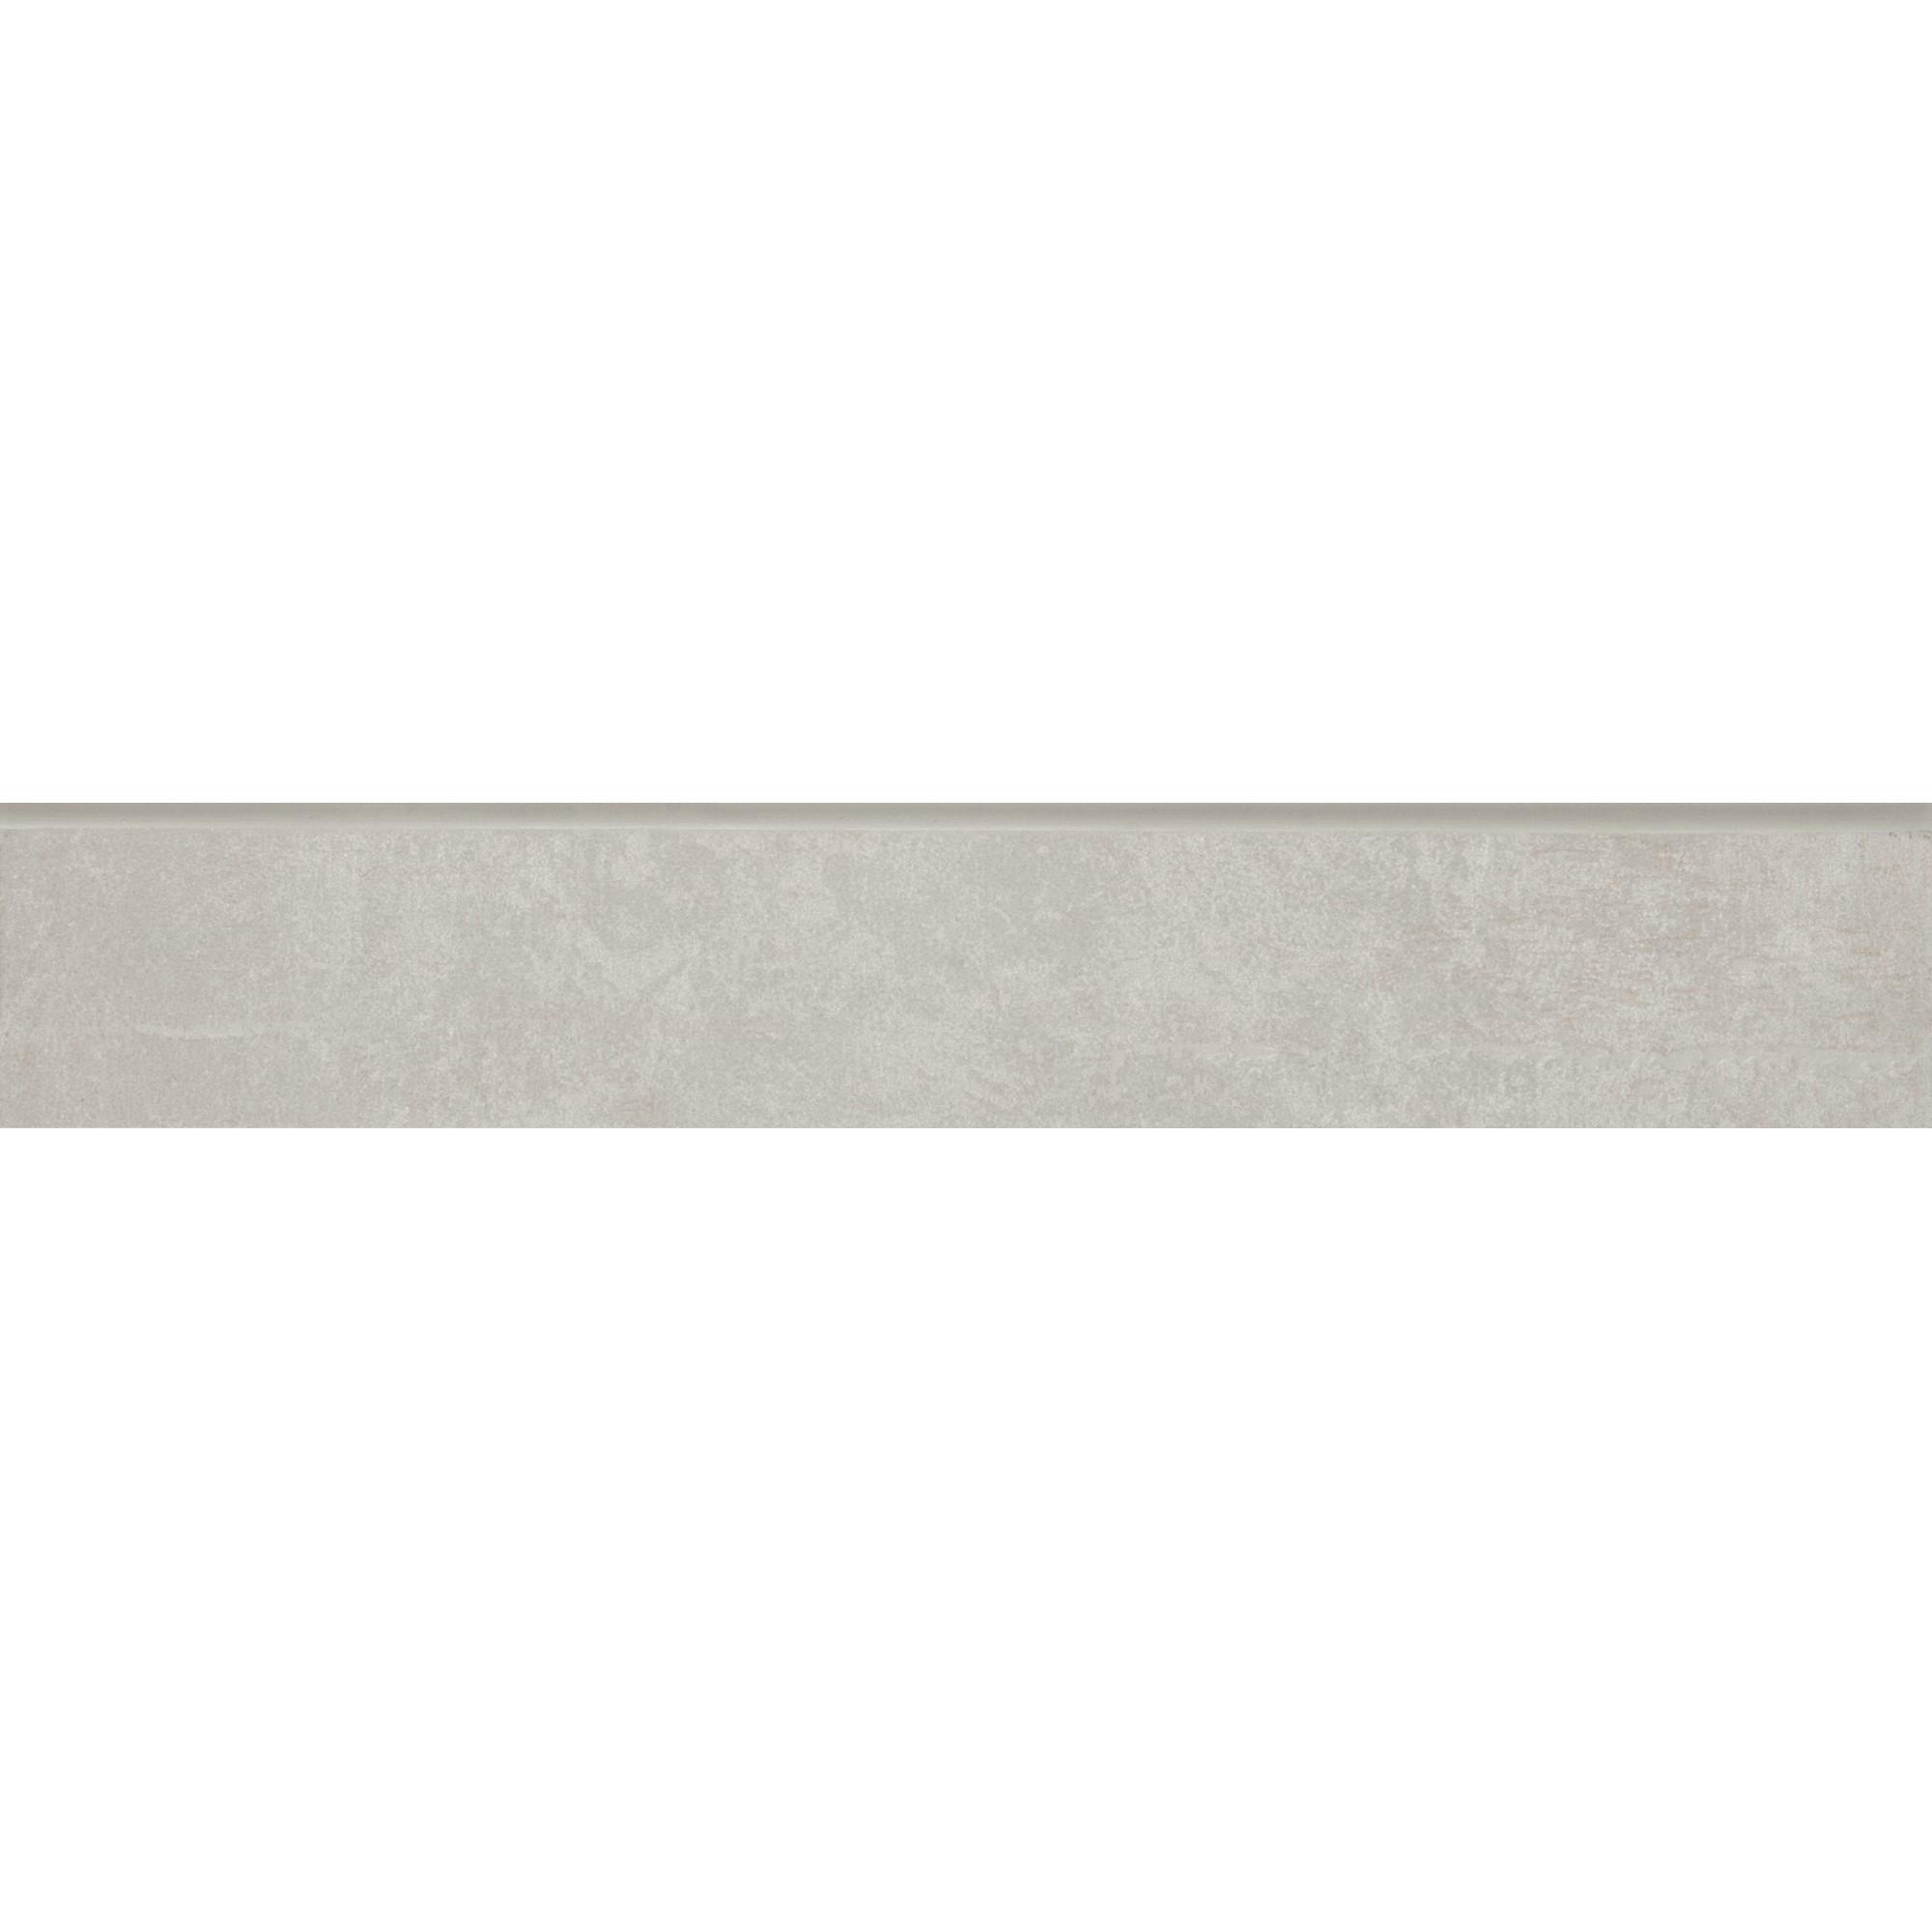 плинтус Grigio (zlxf8324) изображение 0